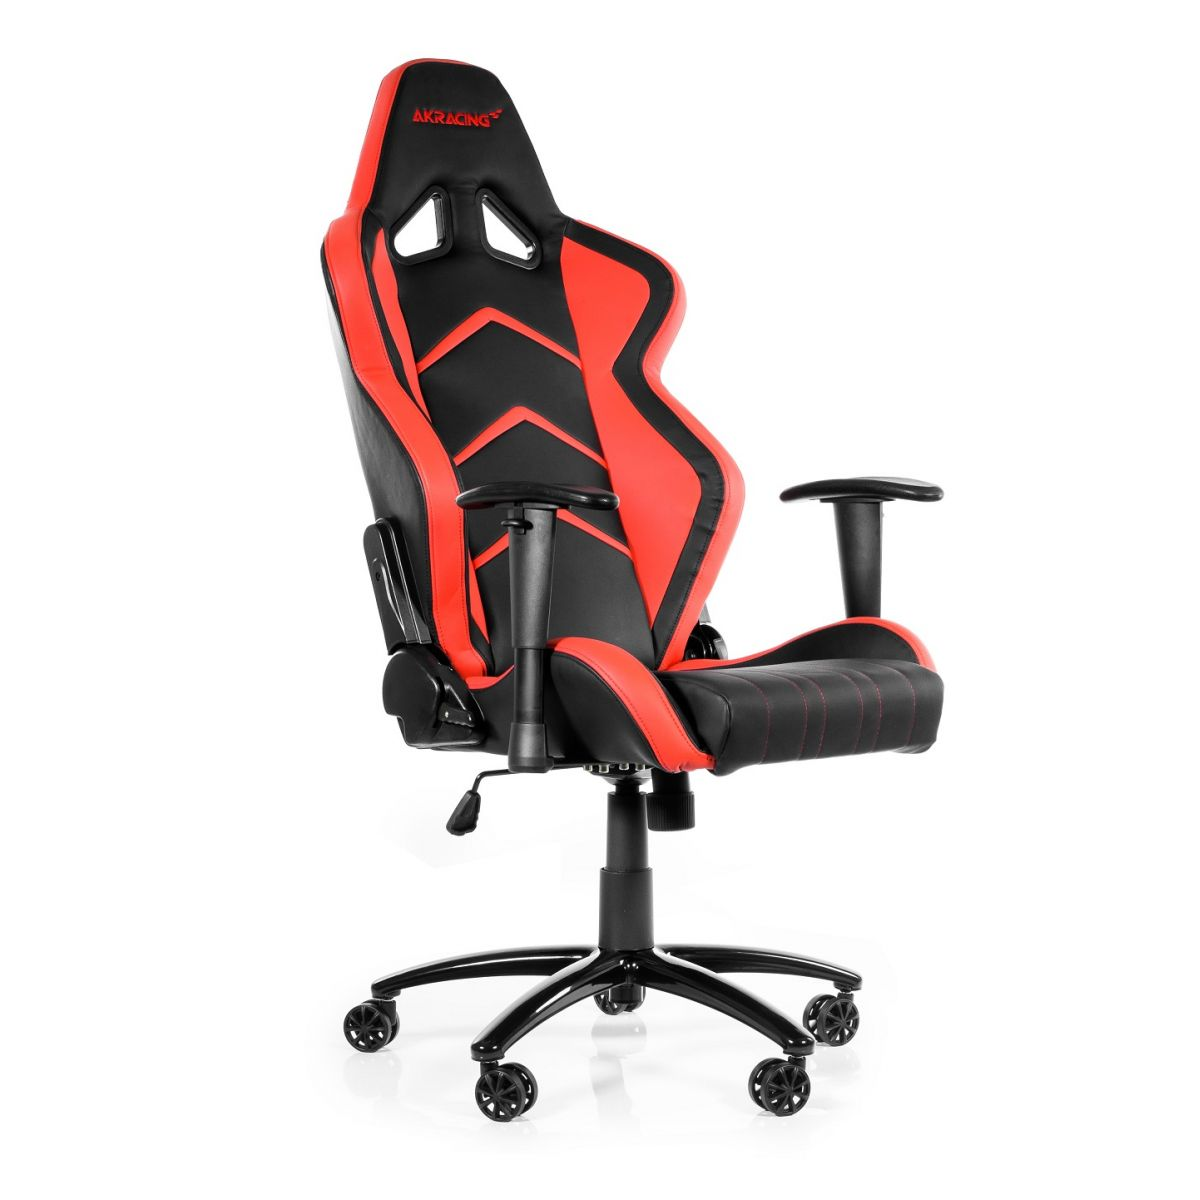 Cadeira AKRacing Player Gaming Black/Red AK-K6014-BR - AKRacing